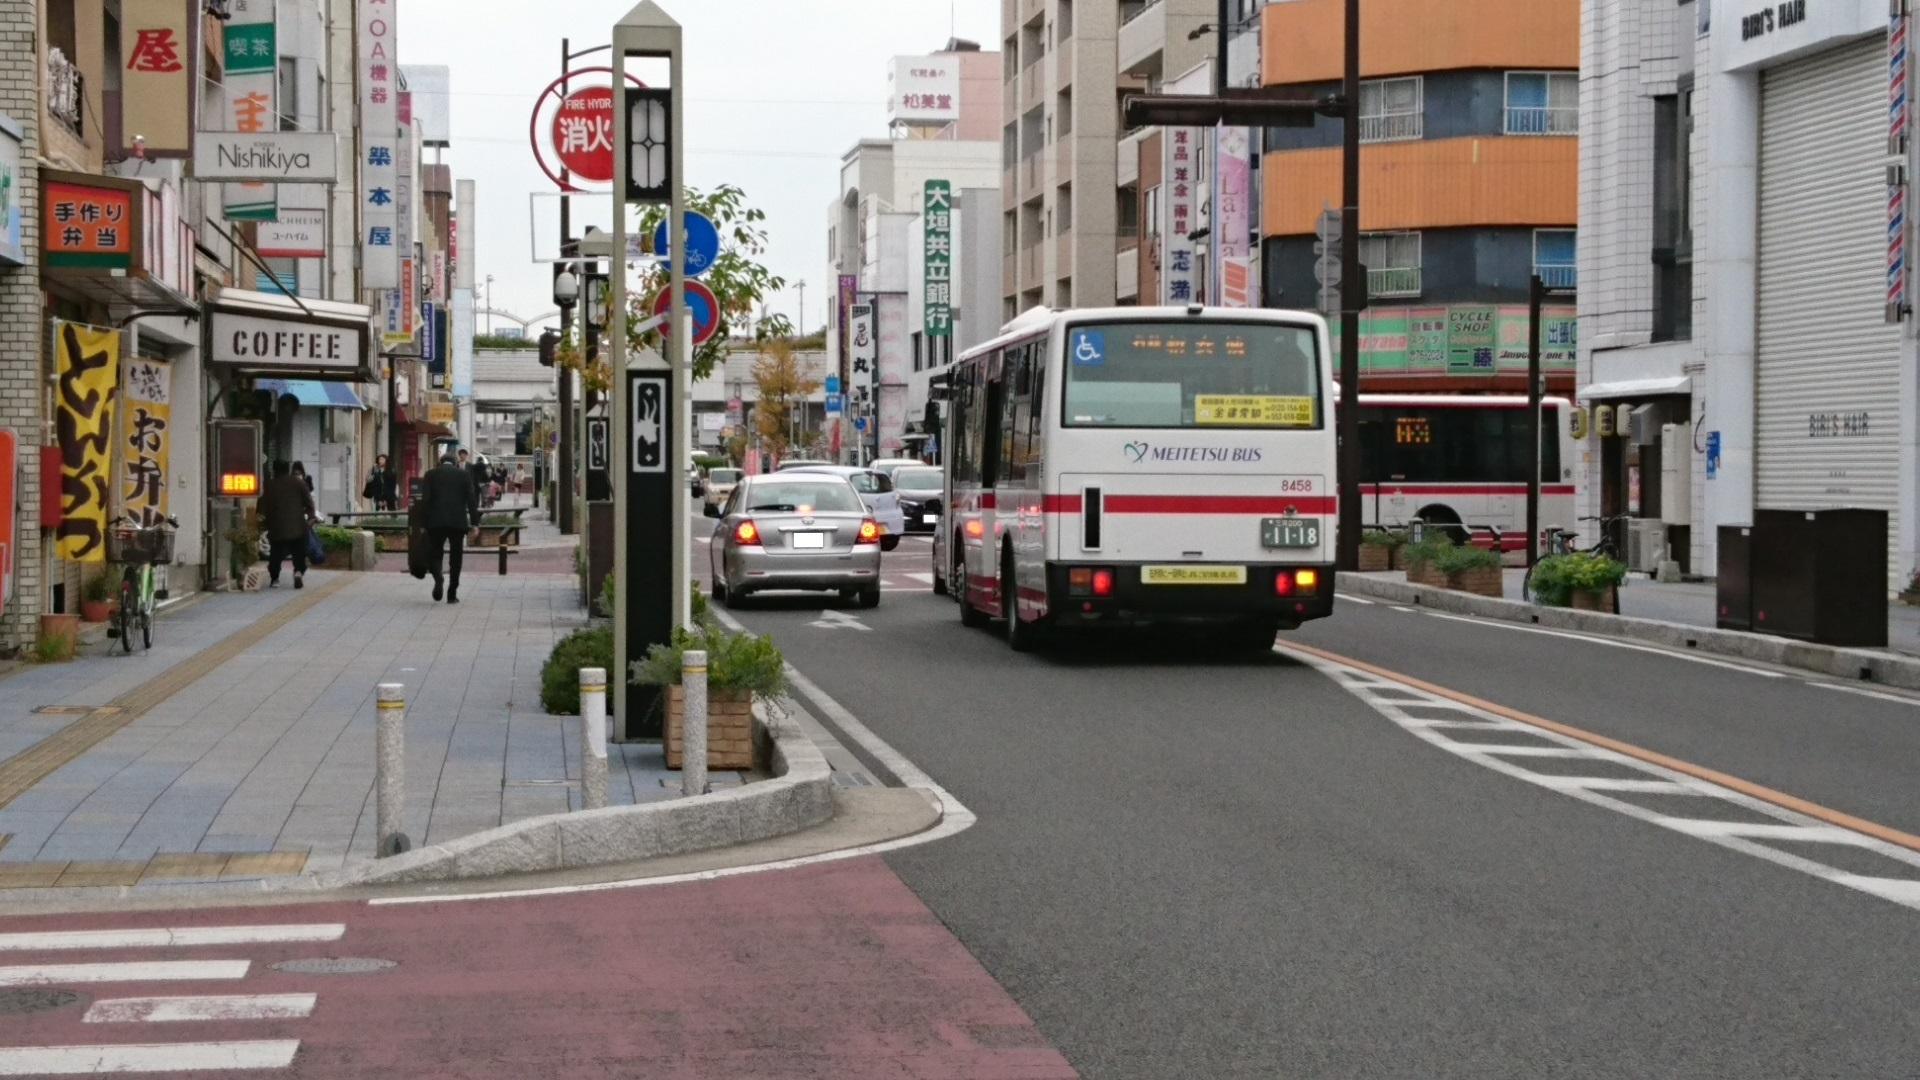 2016.11.8 (1) 御幸本町交差点 - 名鉄バス 1920-1080